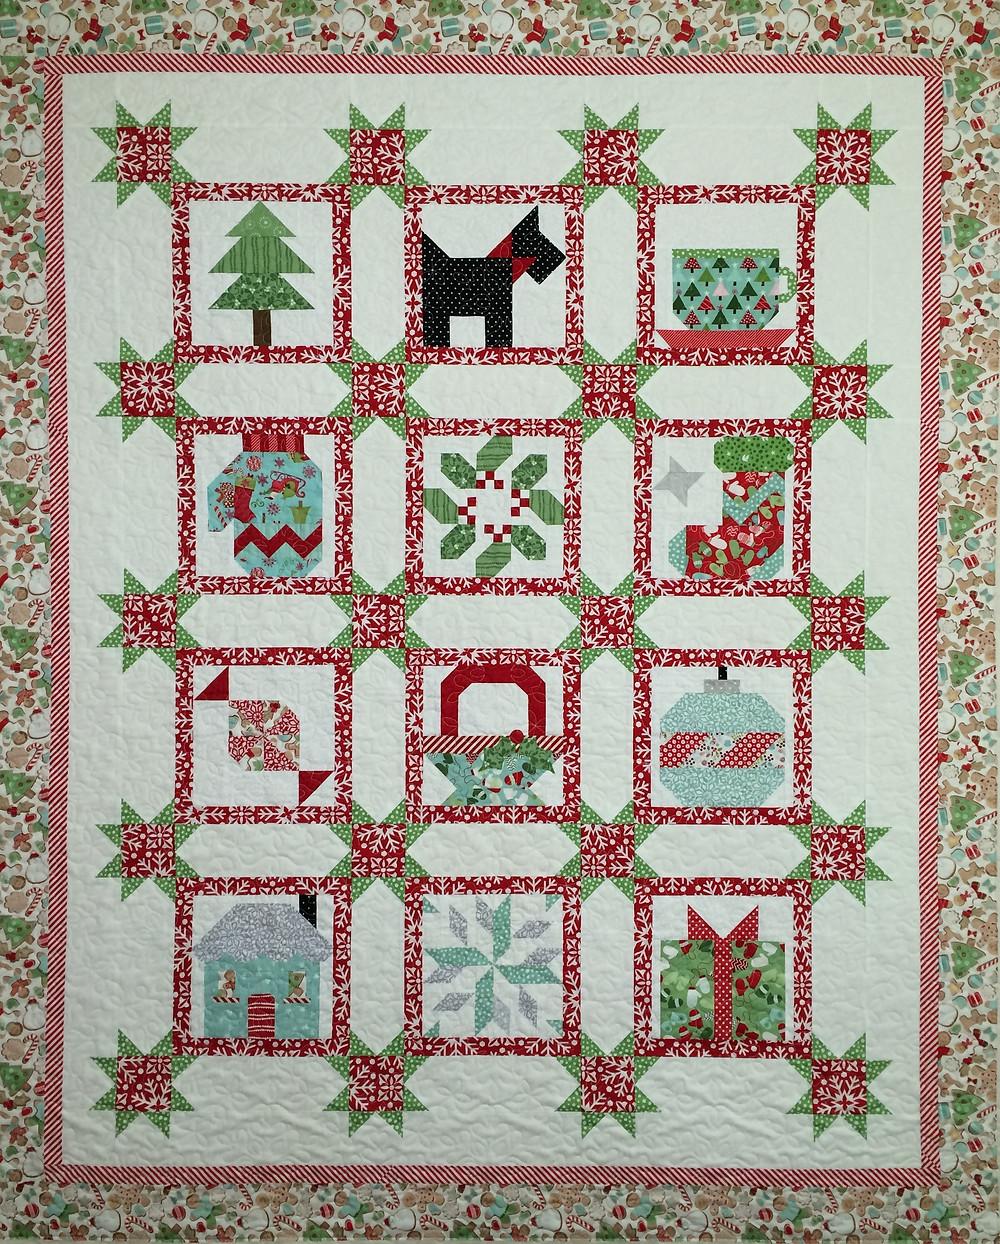 Deb Christmas Quilt with an english scottish dog